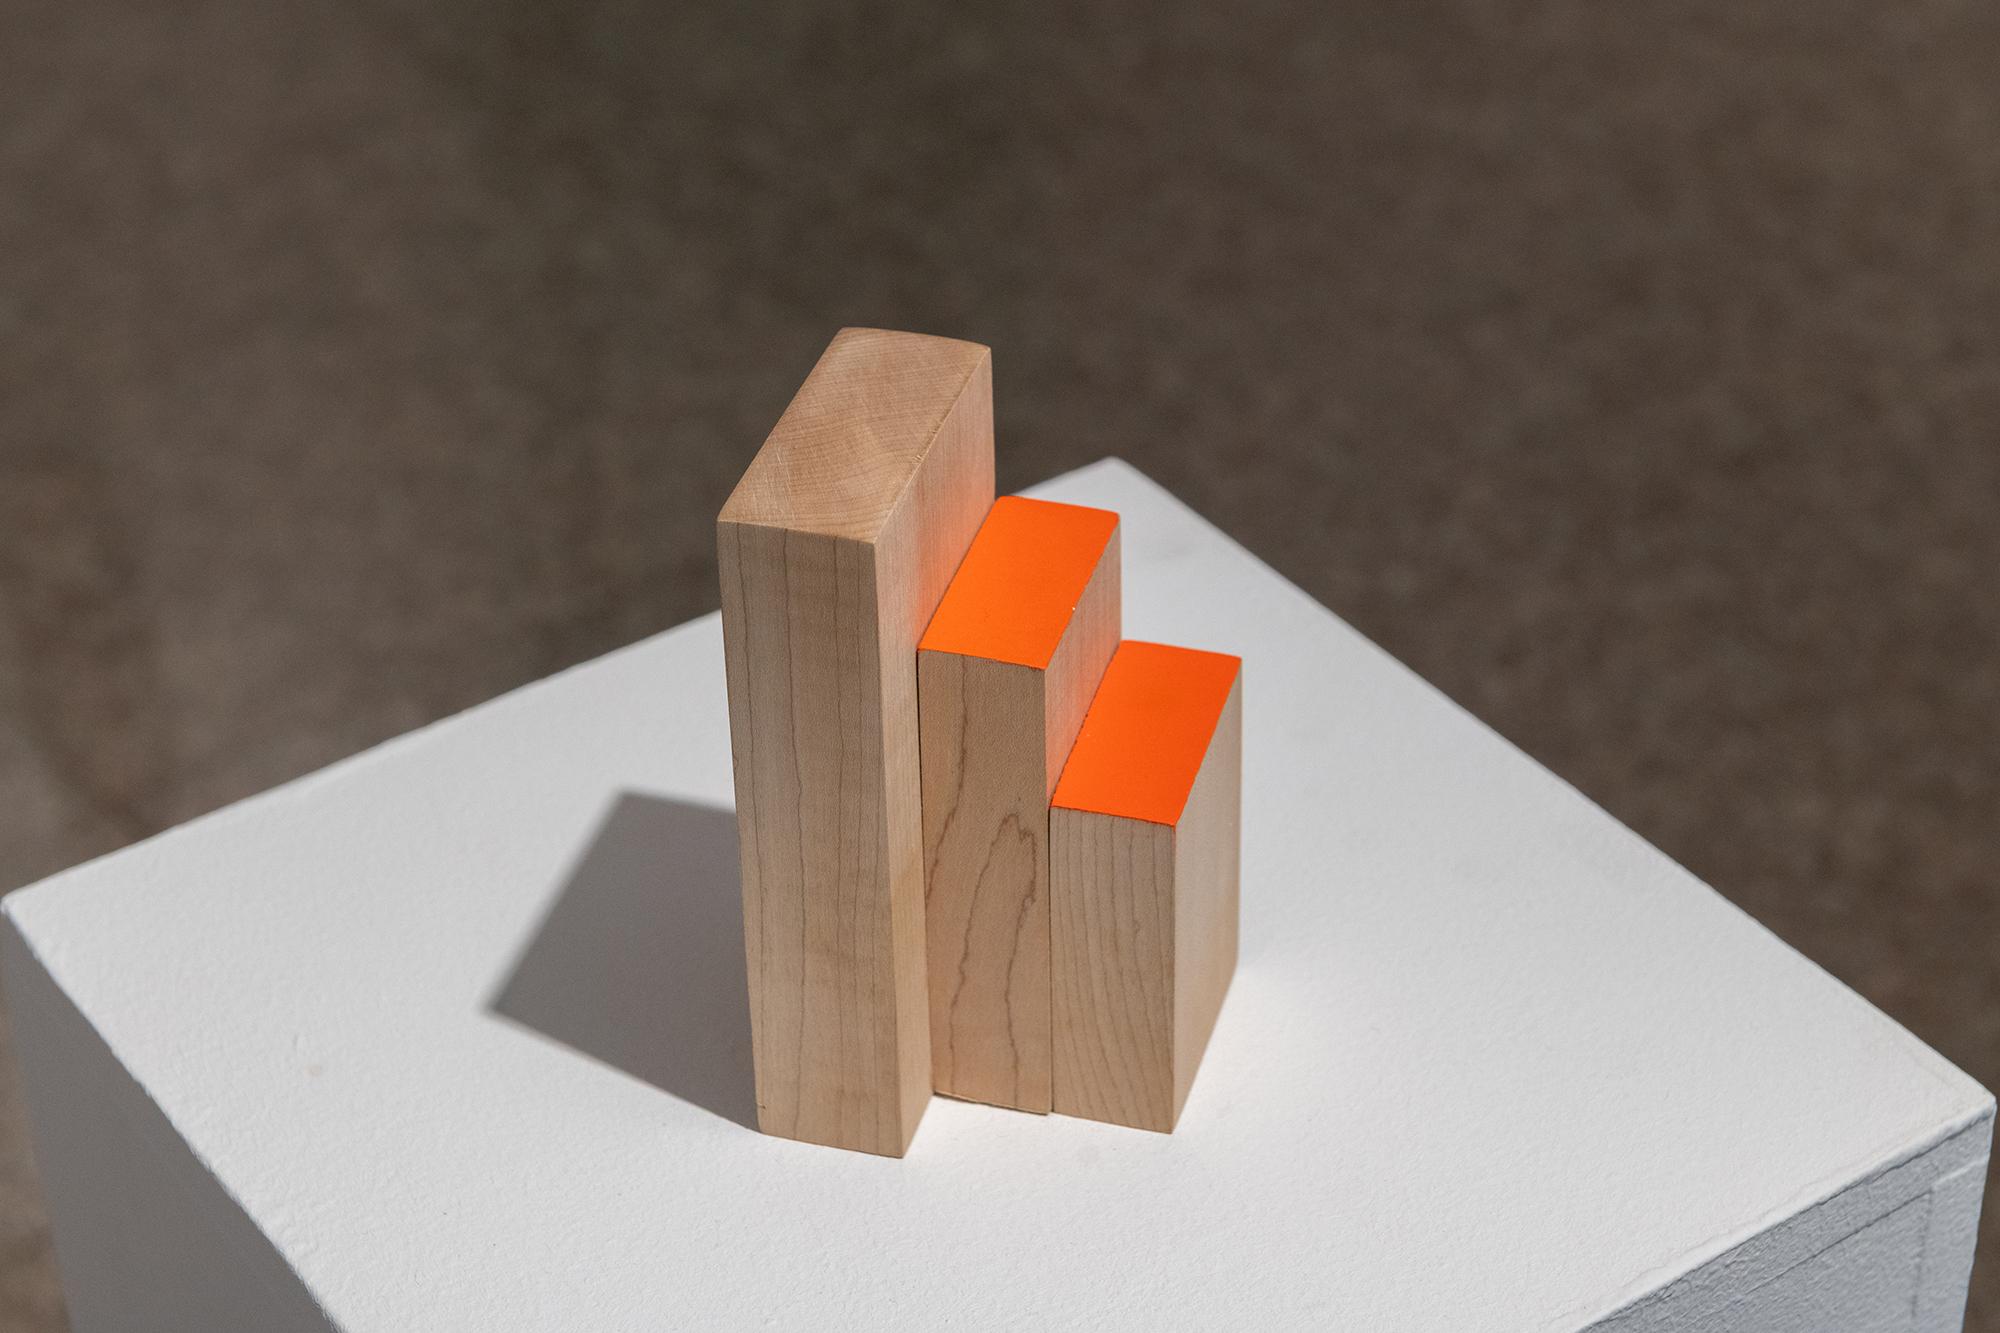 Orange and me, 2019, exhibition view